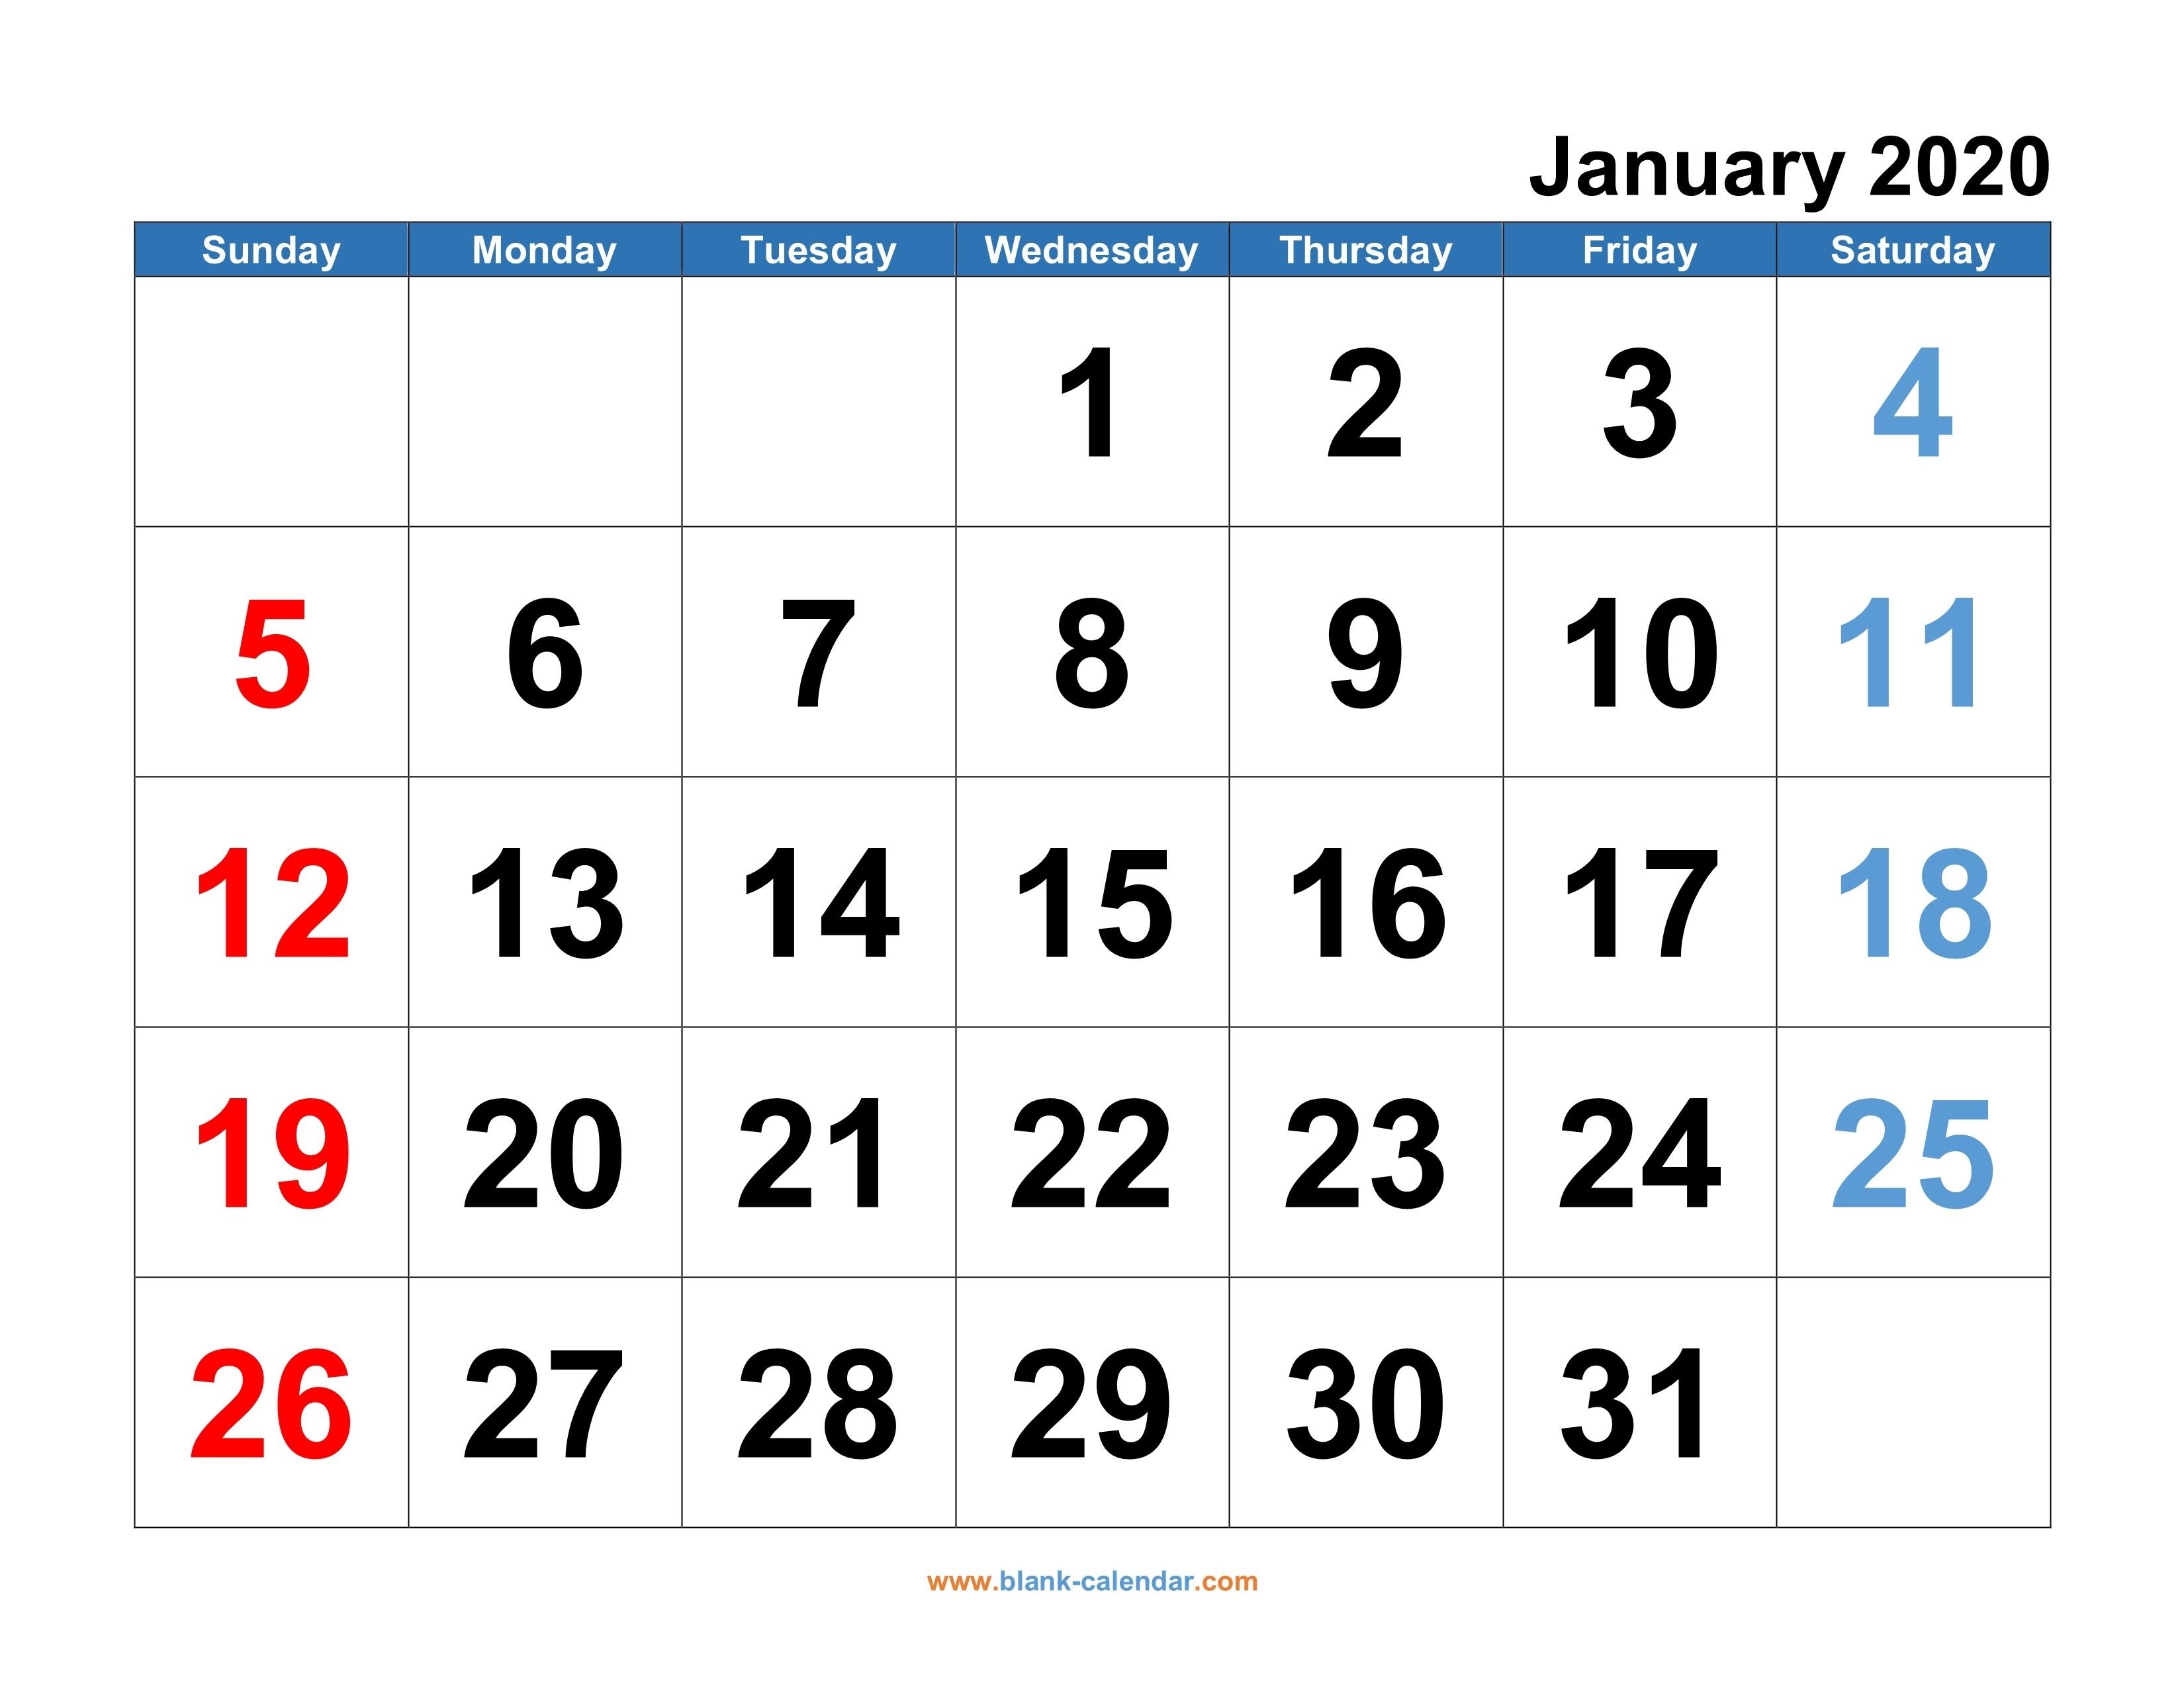 Monthly Calendar 2020 | Free Download, Editable And Printable-Microsoft Calendar Templates 2020